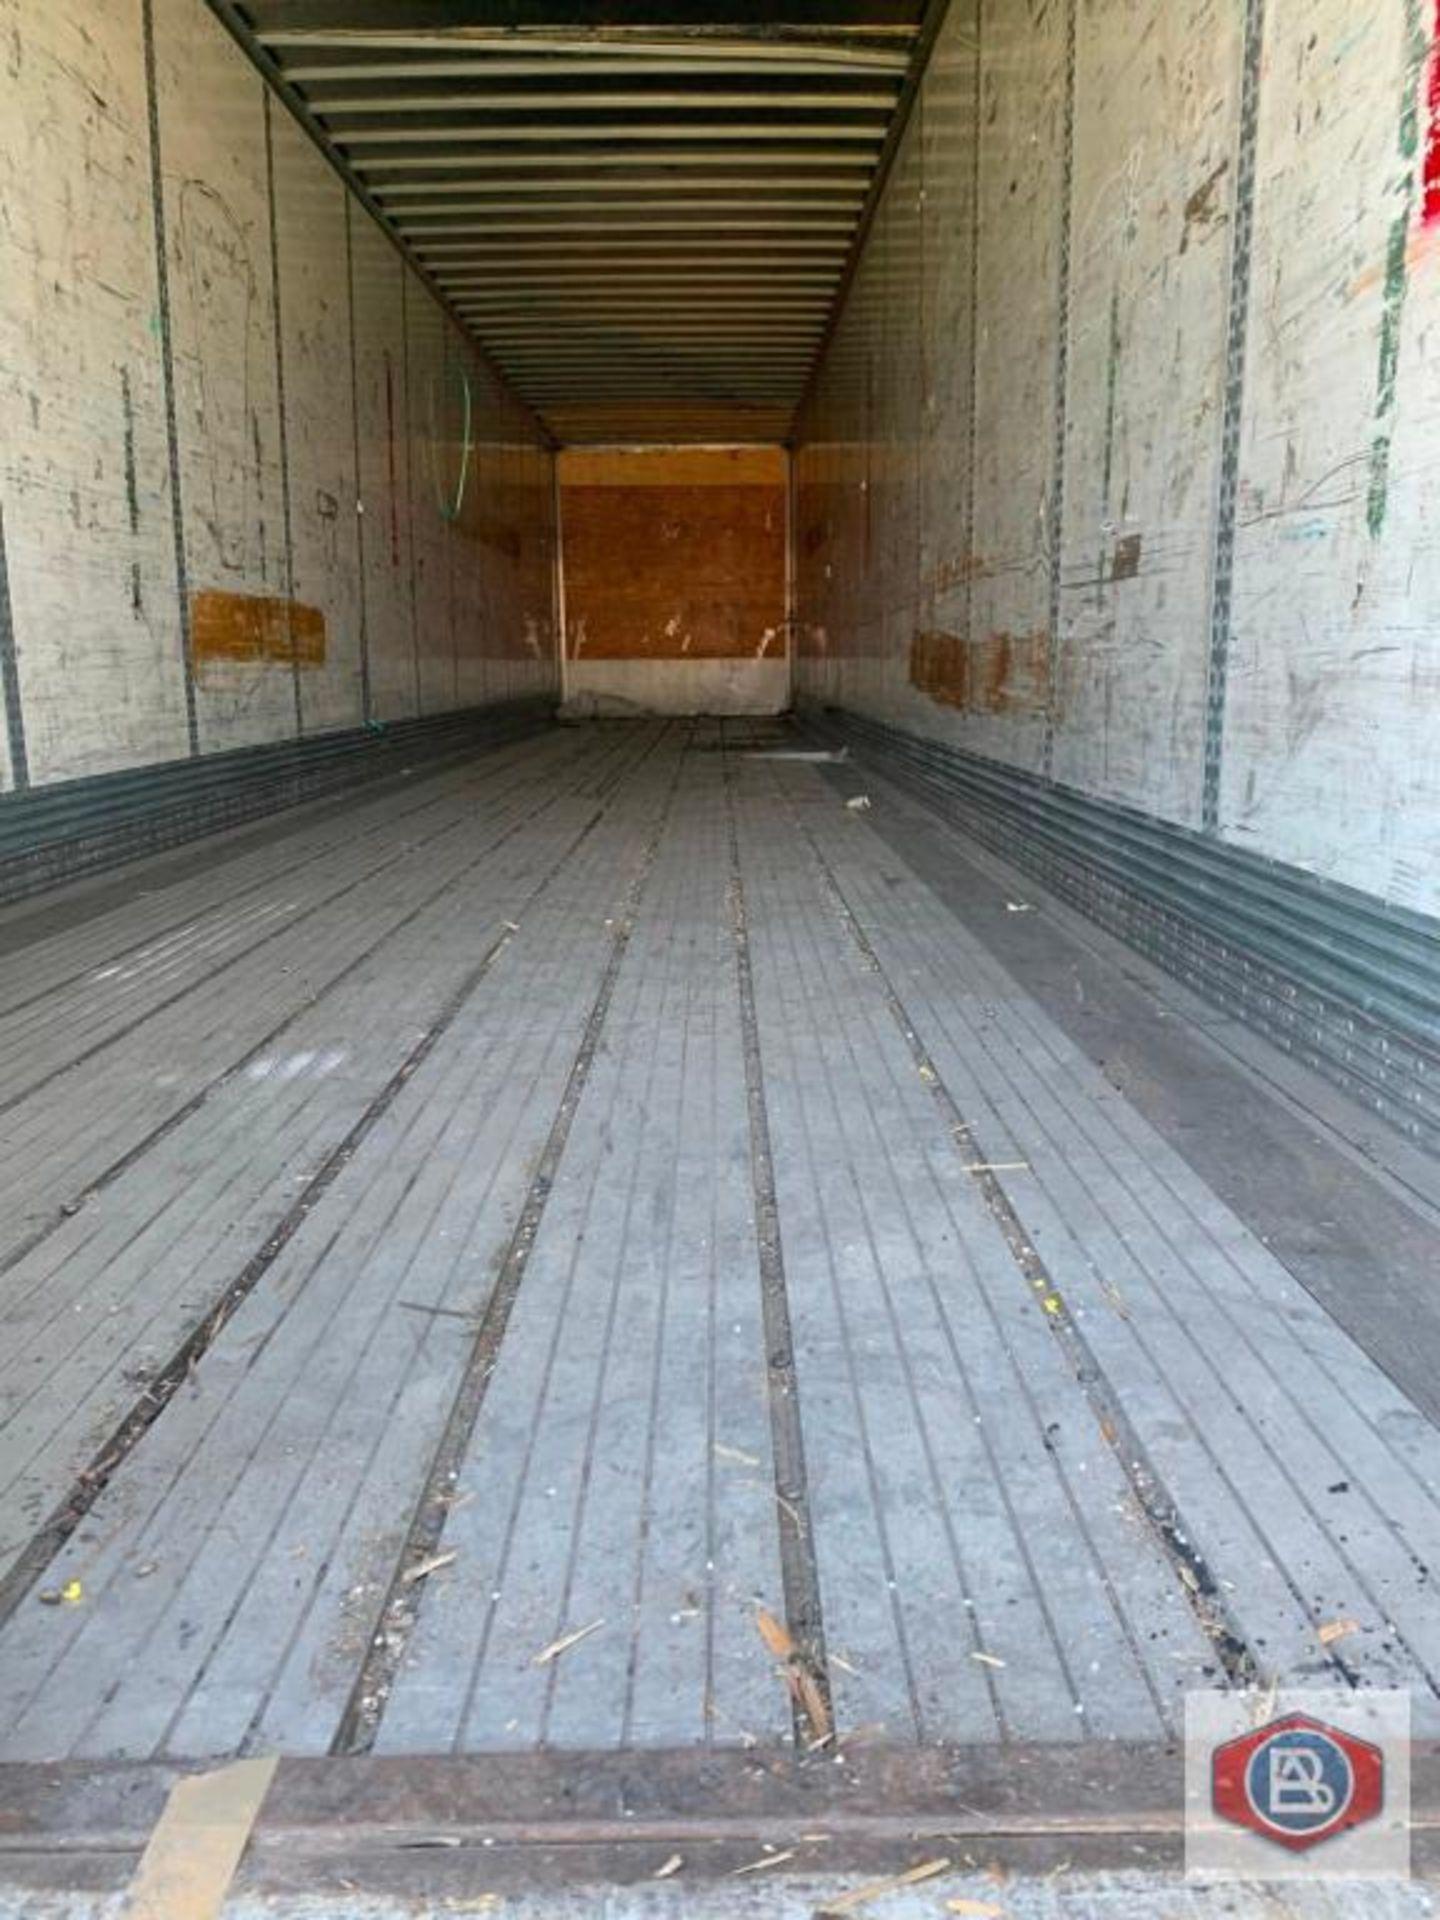 2002 Wabash DuraPlate Logistics Van Trailer 53 ft. - Image 5 of 6